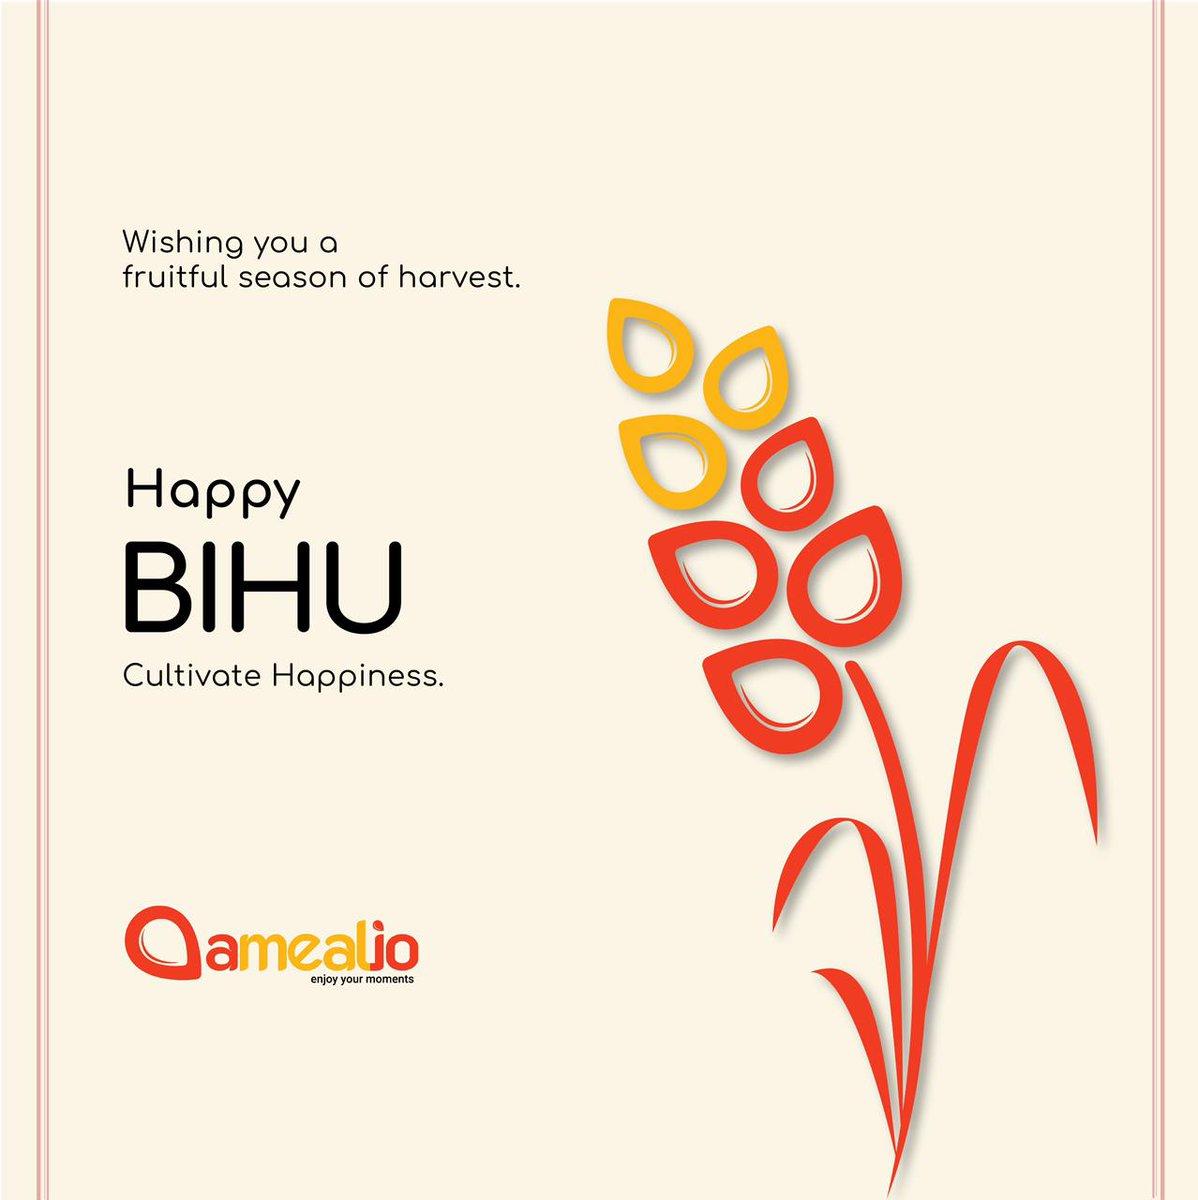 Warm wishes on occasion of Bihu festival 🌾😊   #amealio #contactless #dinning #experience #bihu #festival #festivevibes #festiveseason #celebration #enjoyment #spreadinghappiness #spreadingsmiles #joy